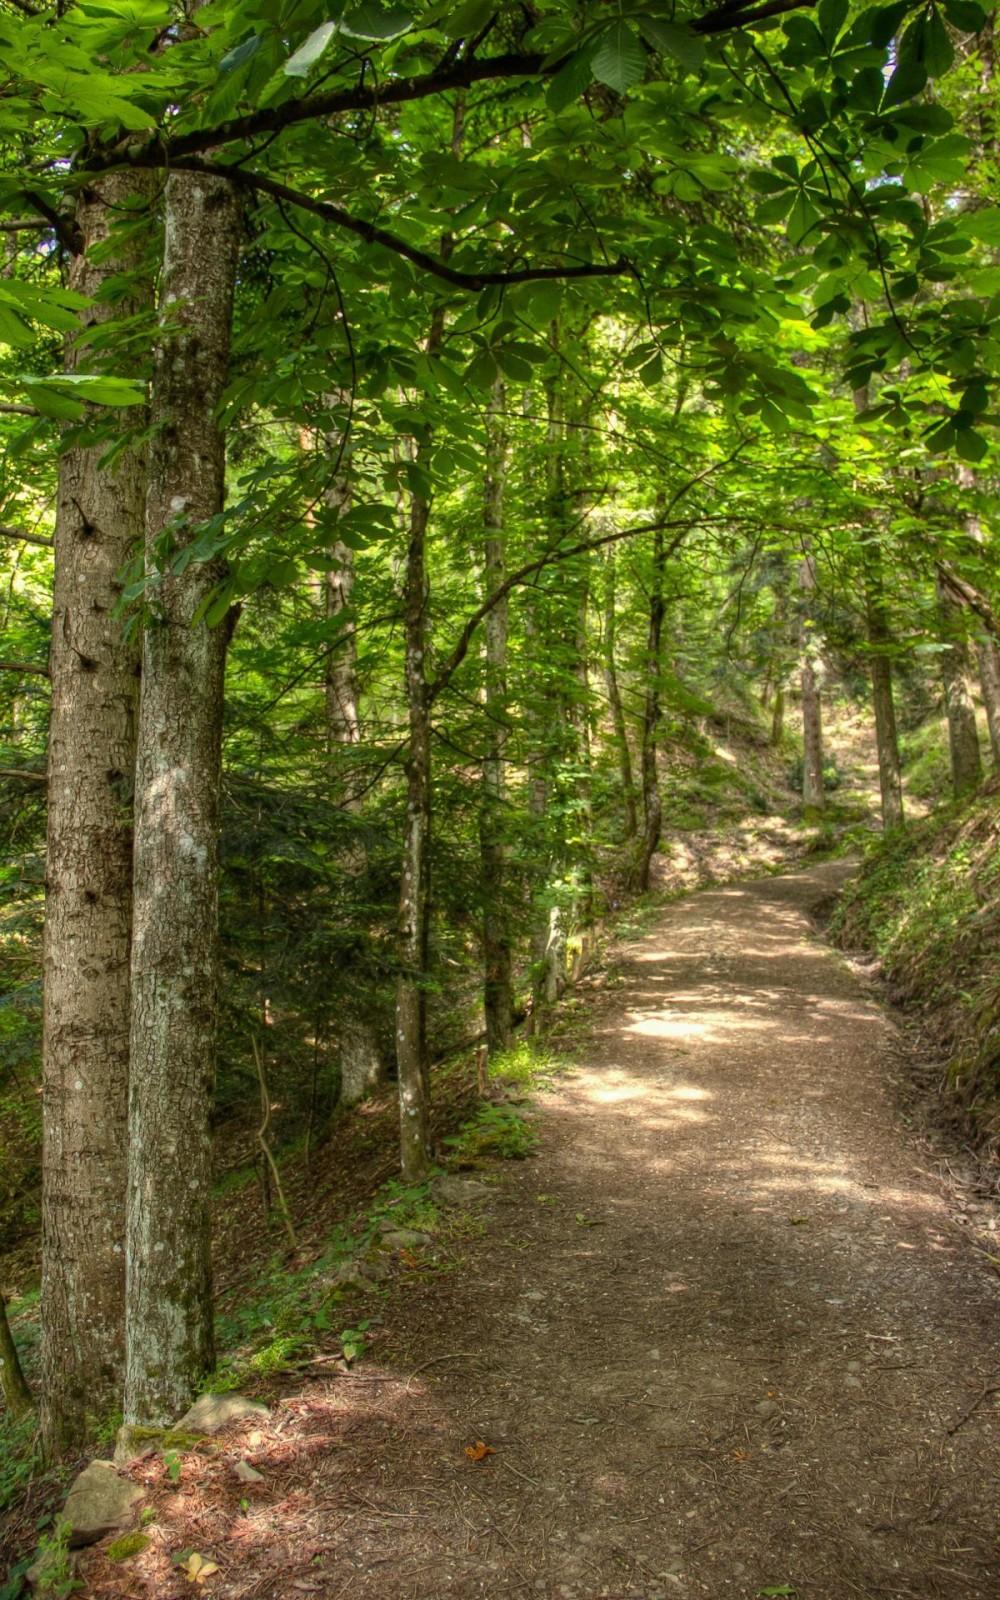 The Forest in Porretta Terme